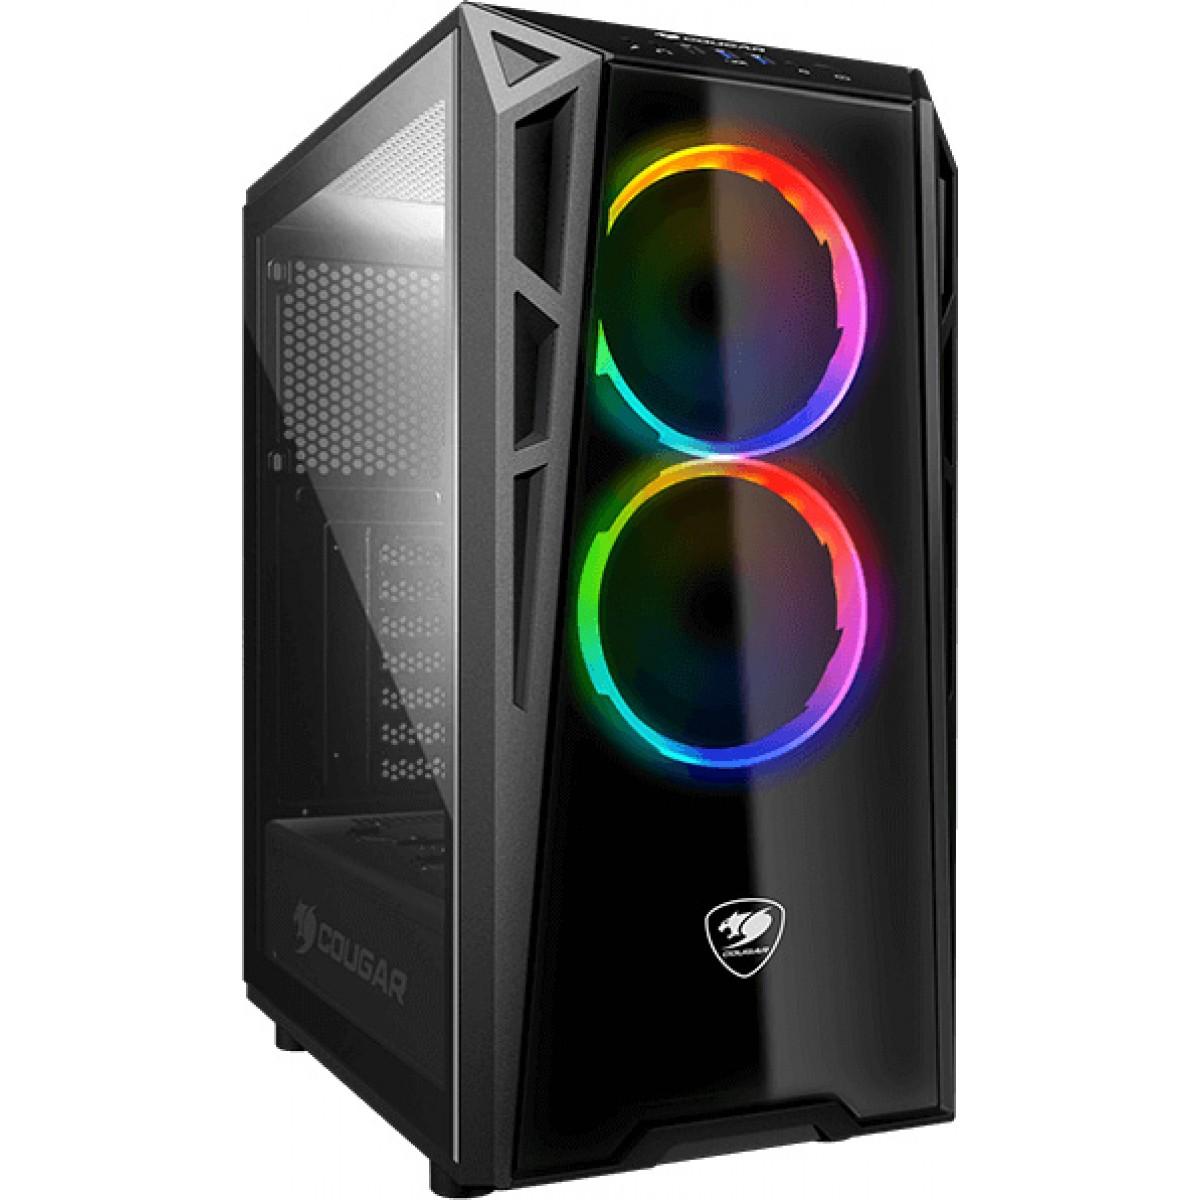 Pc Gamer T-Power Ultra LVL-1 AMD Ryzen 9 3950x / Geforce RTX 2080 Super / DDR4 16GB / HD 1TB / 750W